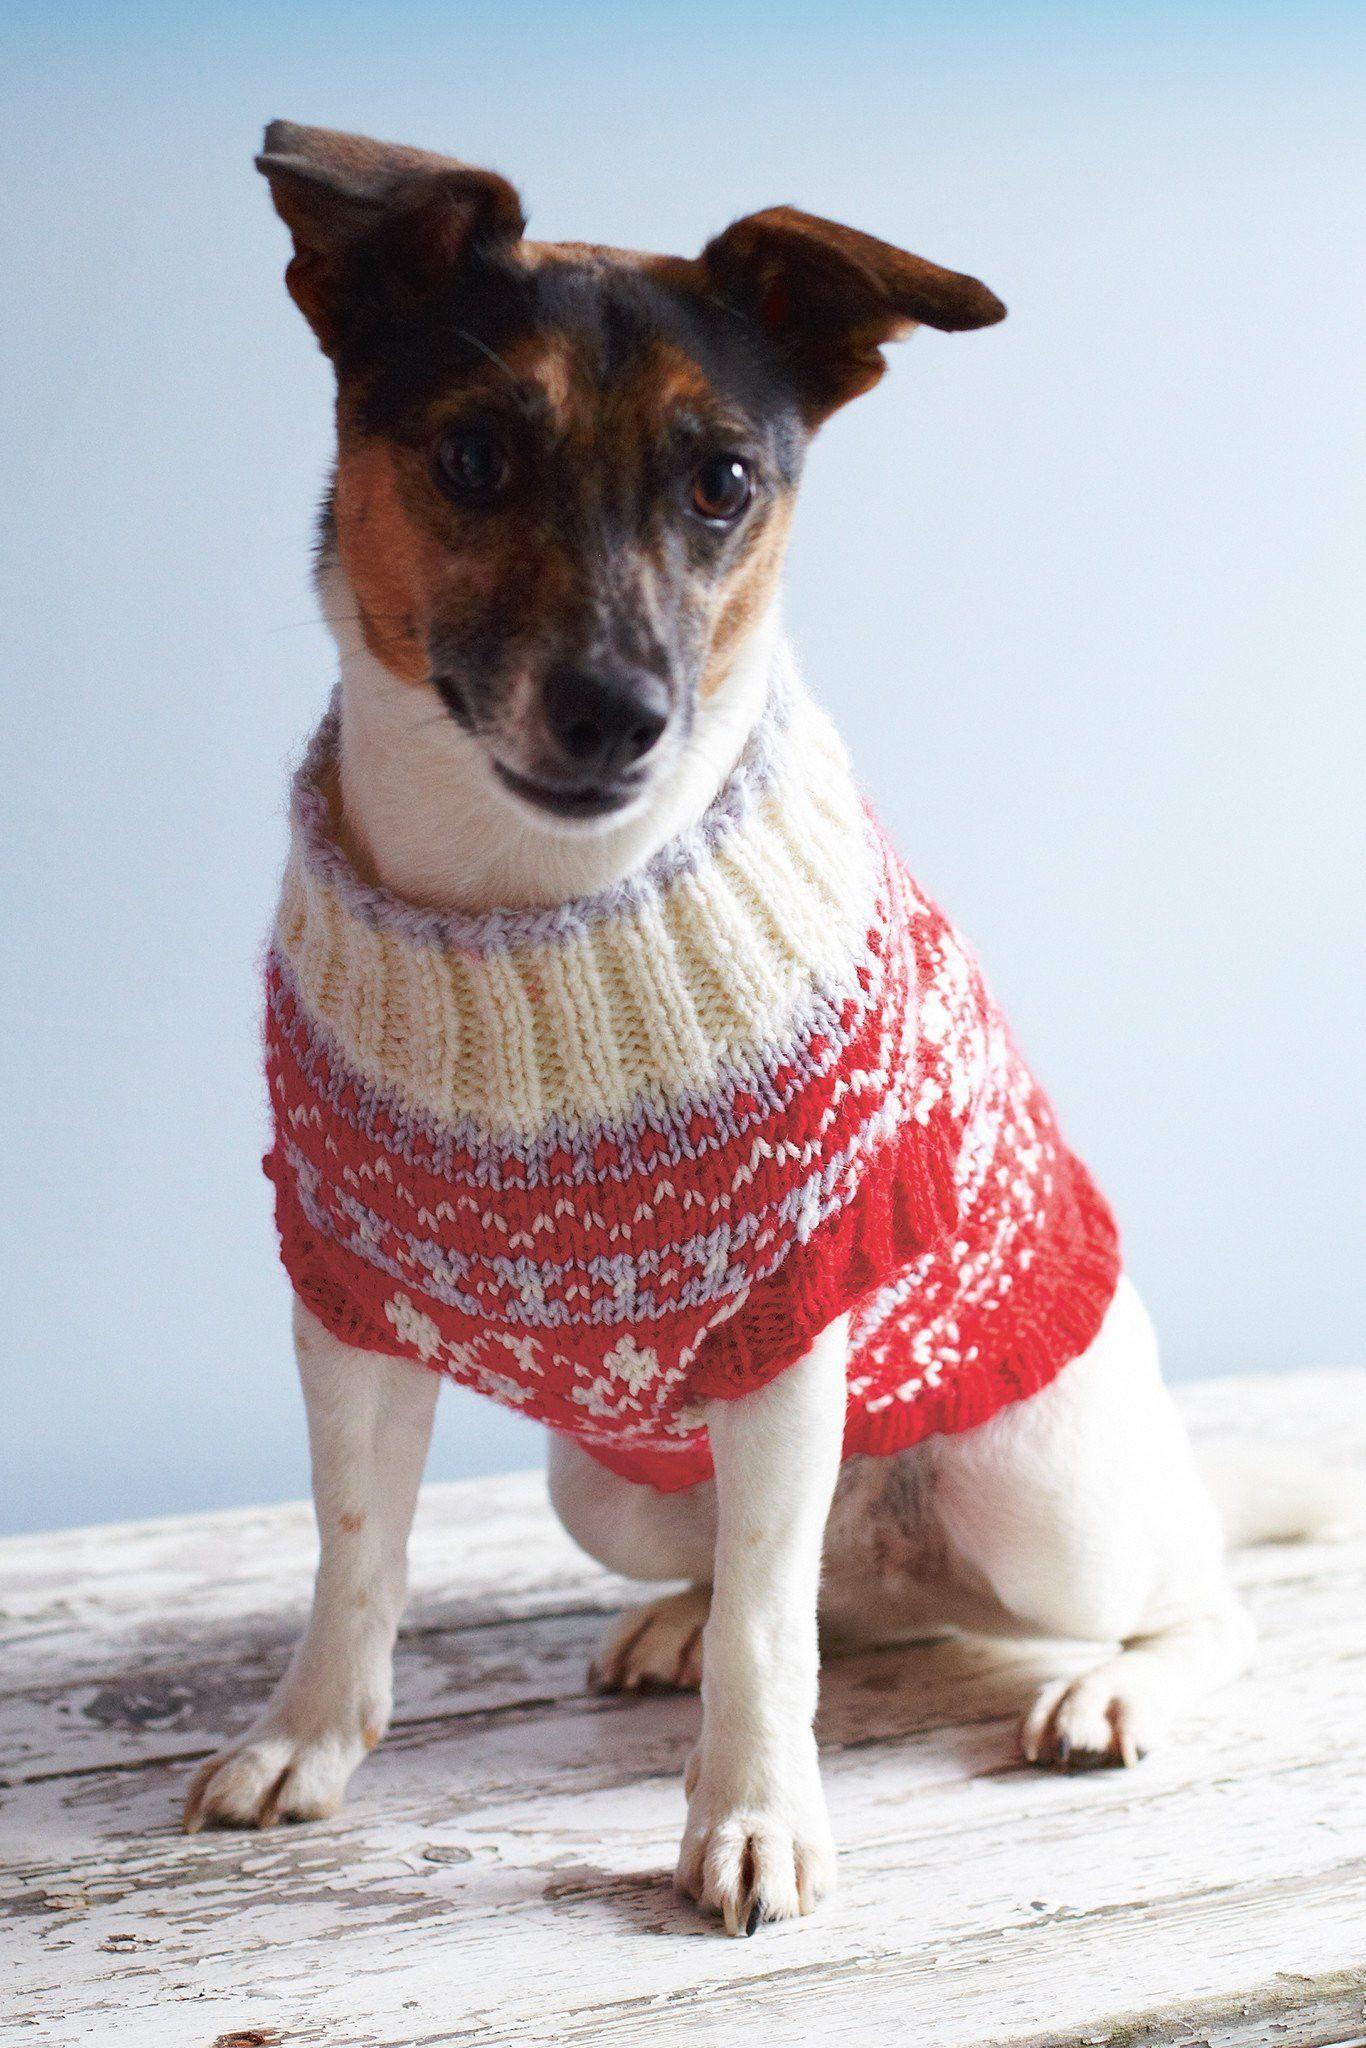 Dog Coat Knitting Pattern | The Knitting Network